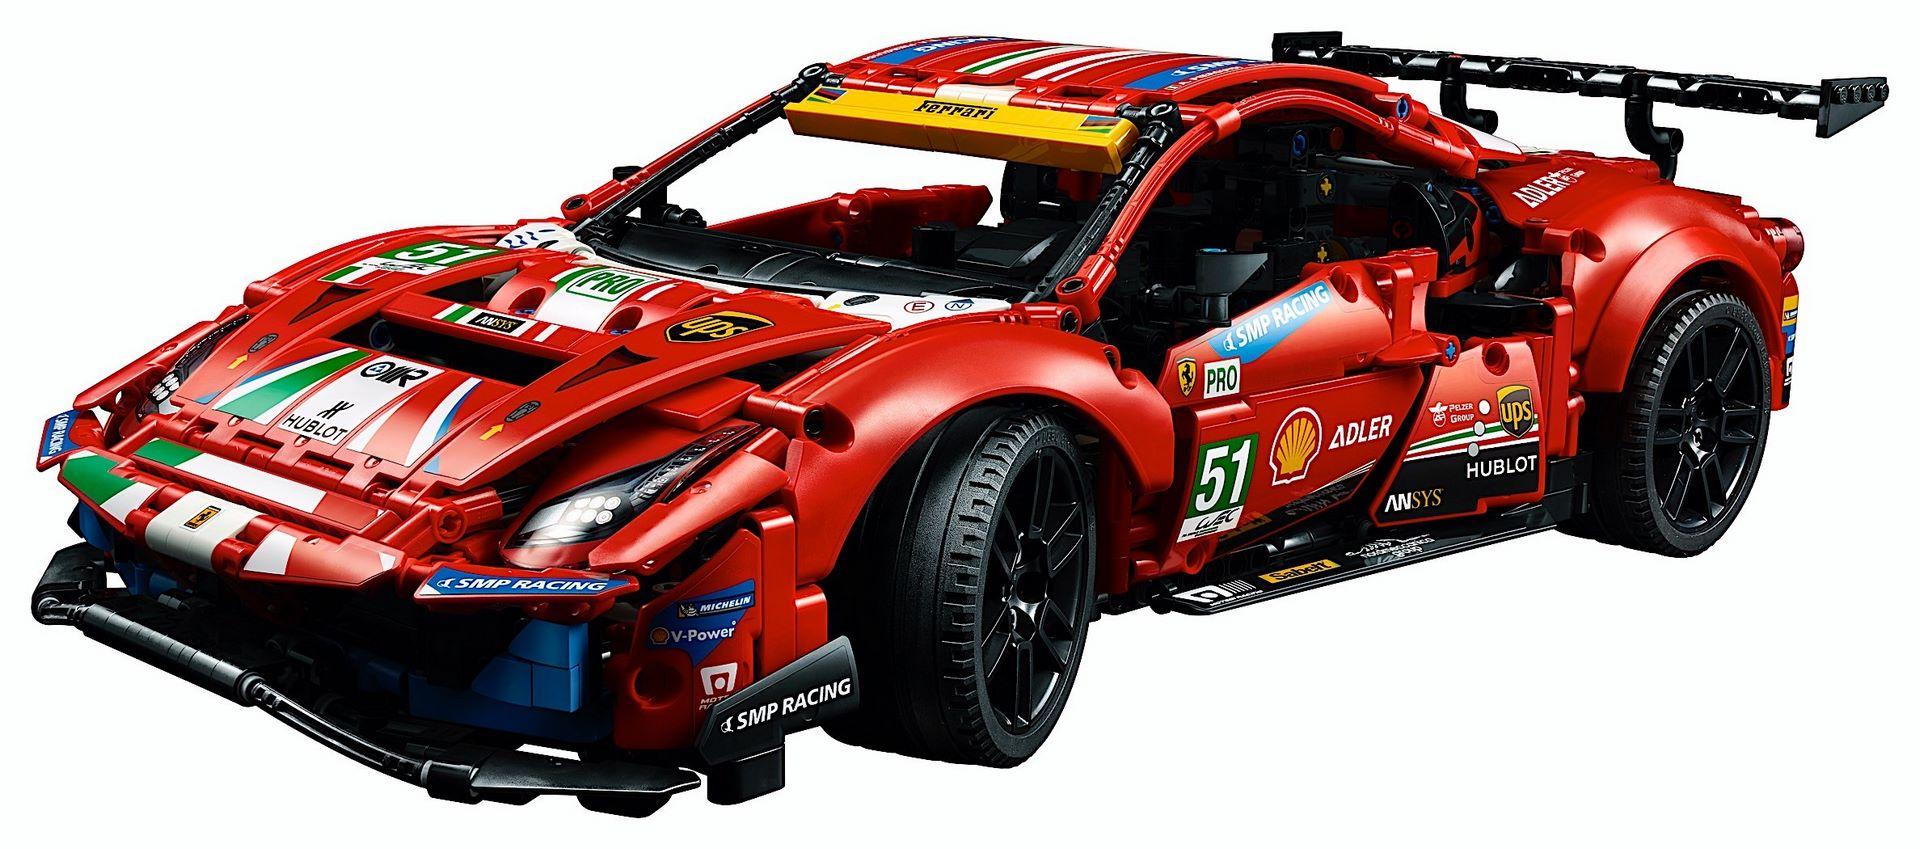 Lego-Technic-Ferrari-488-GTE-AF-Corse-51-13